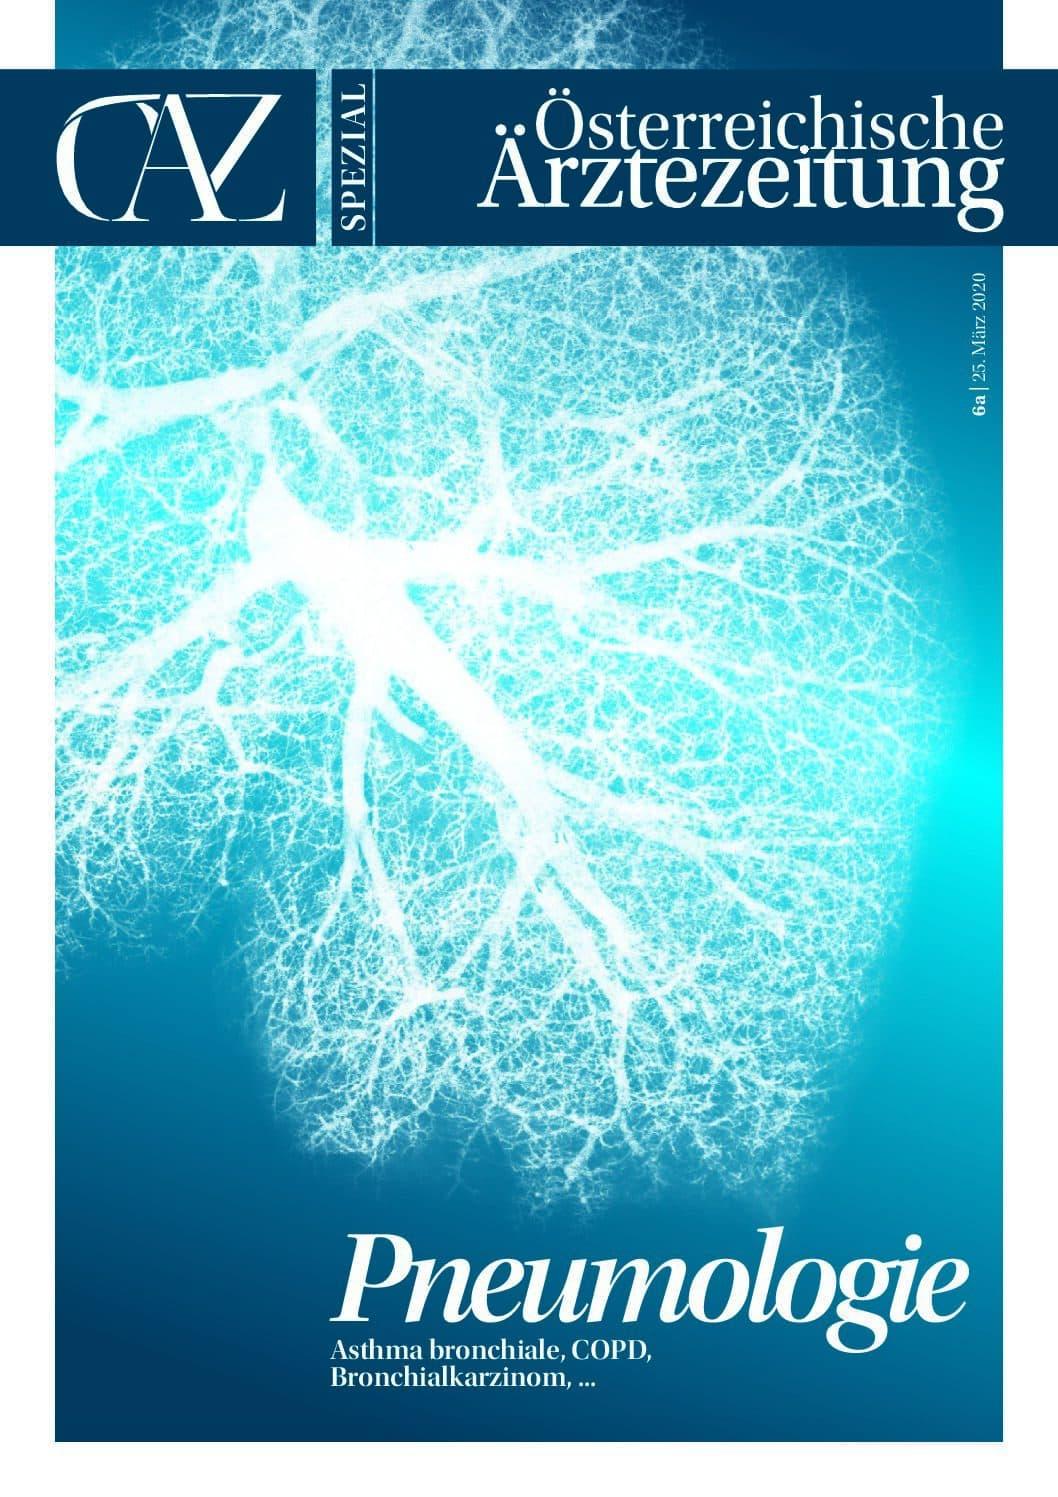 OAZ Spezial Pneumologie 2020